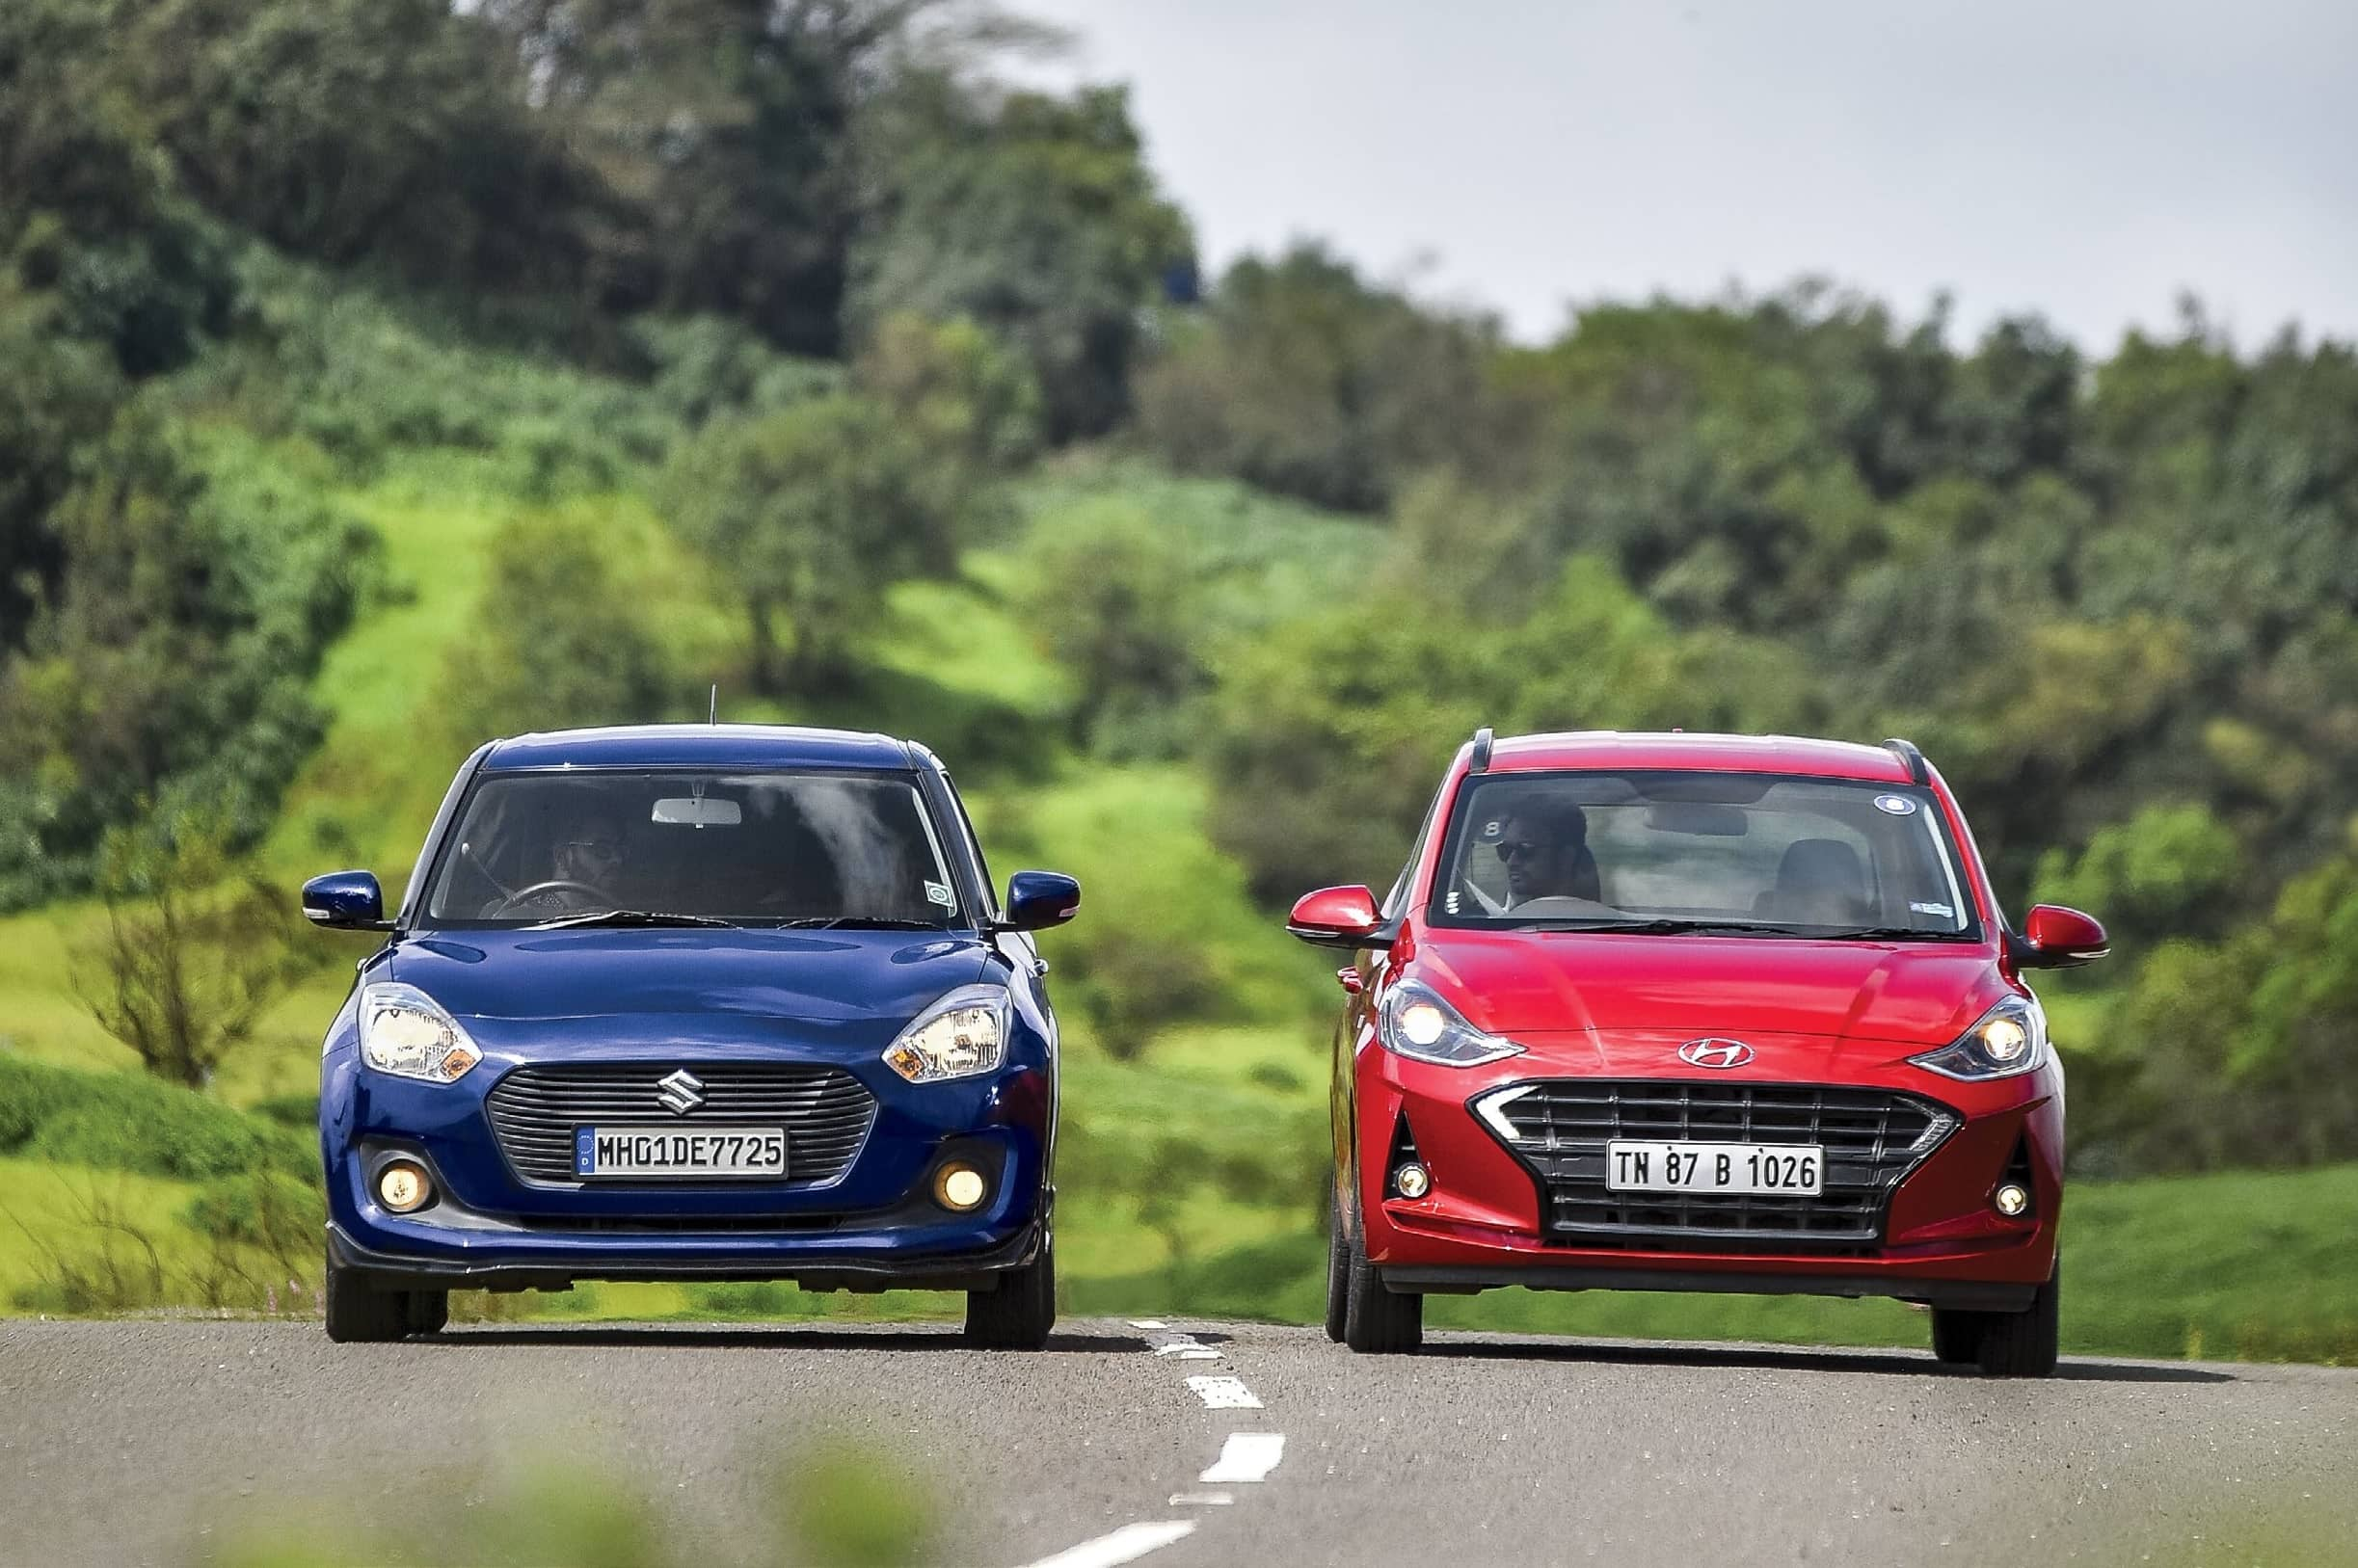 Hyundai Grand i10 Vs Maruti Swift AMT - Fun Size